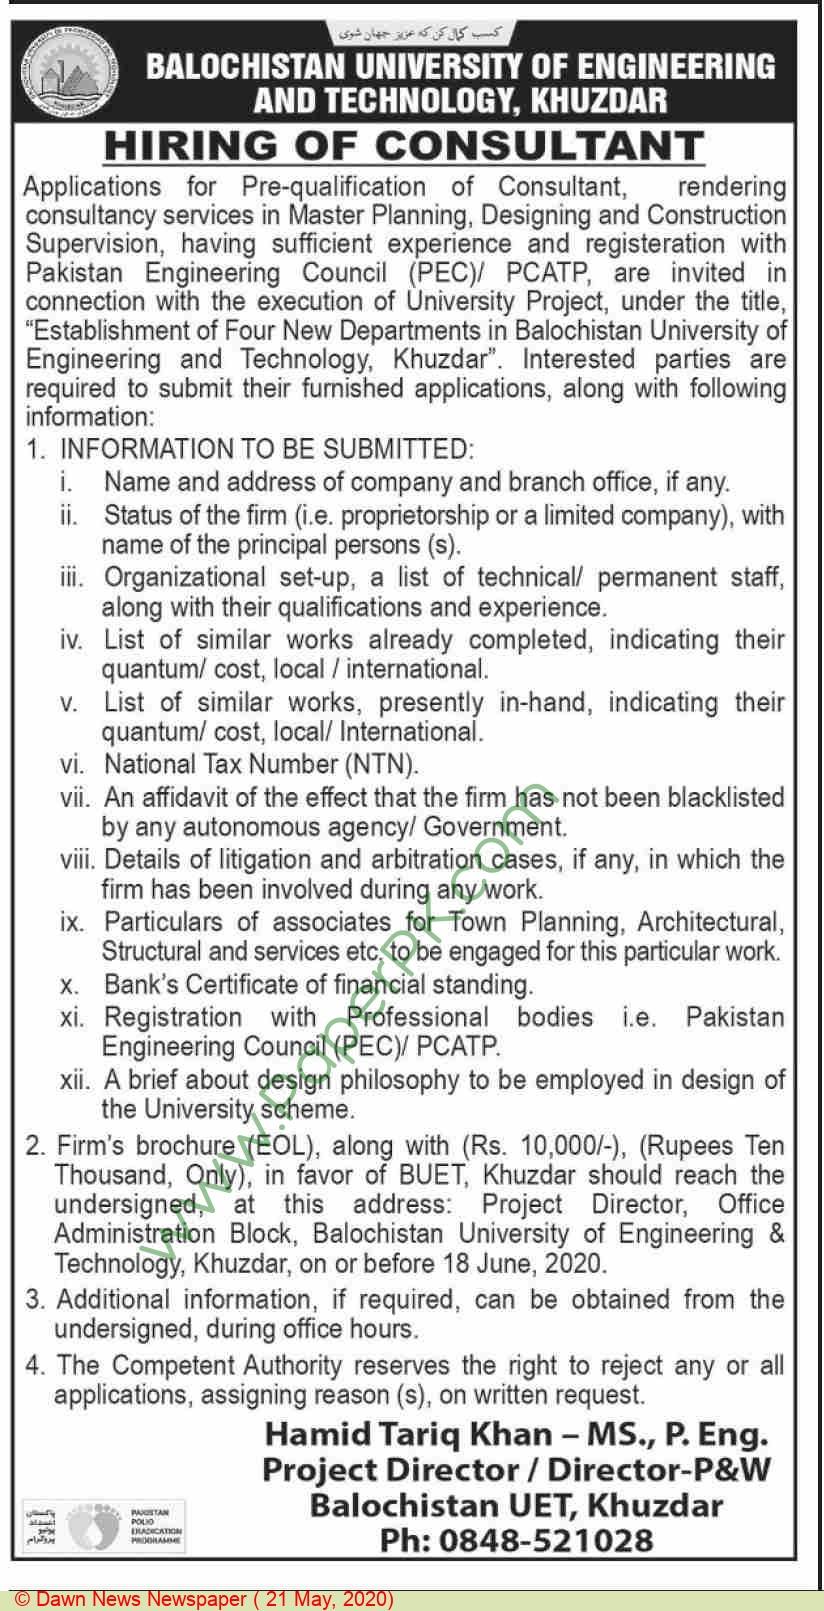 Balochistan University Of Engineering & Technology Khuzdar Tender Notice